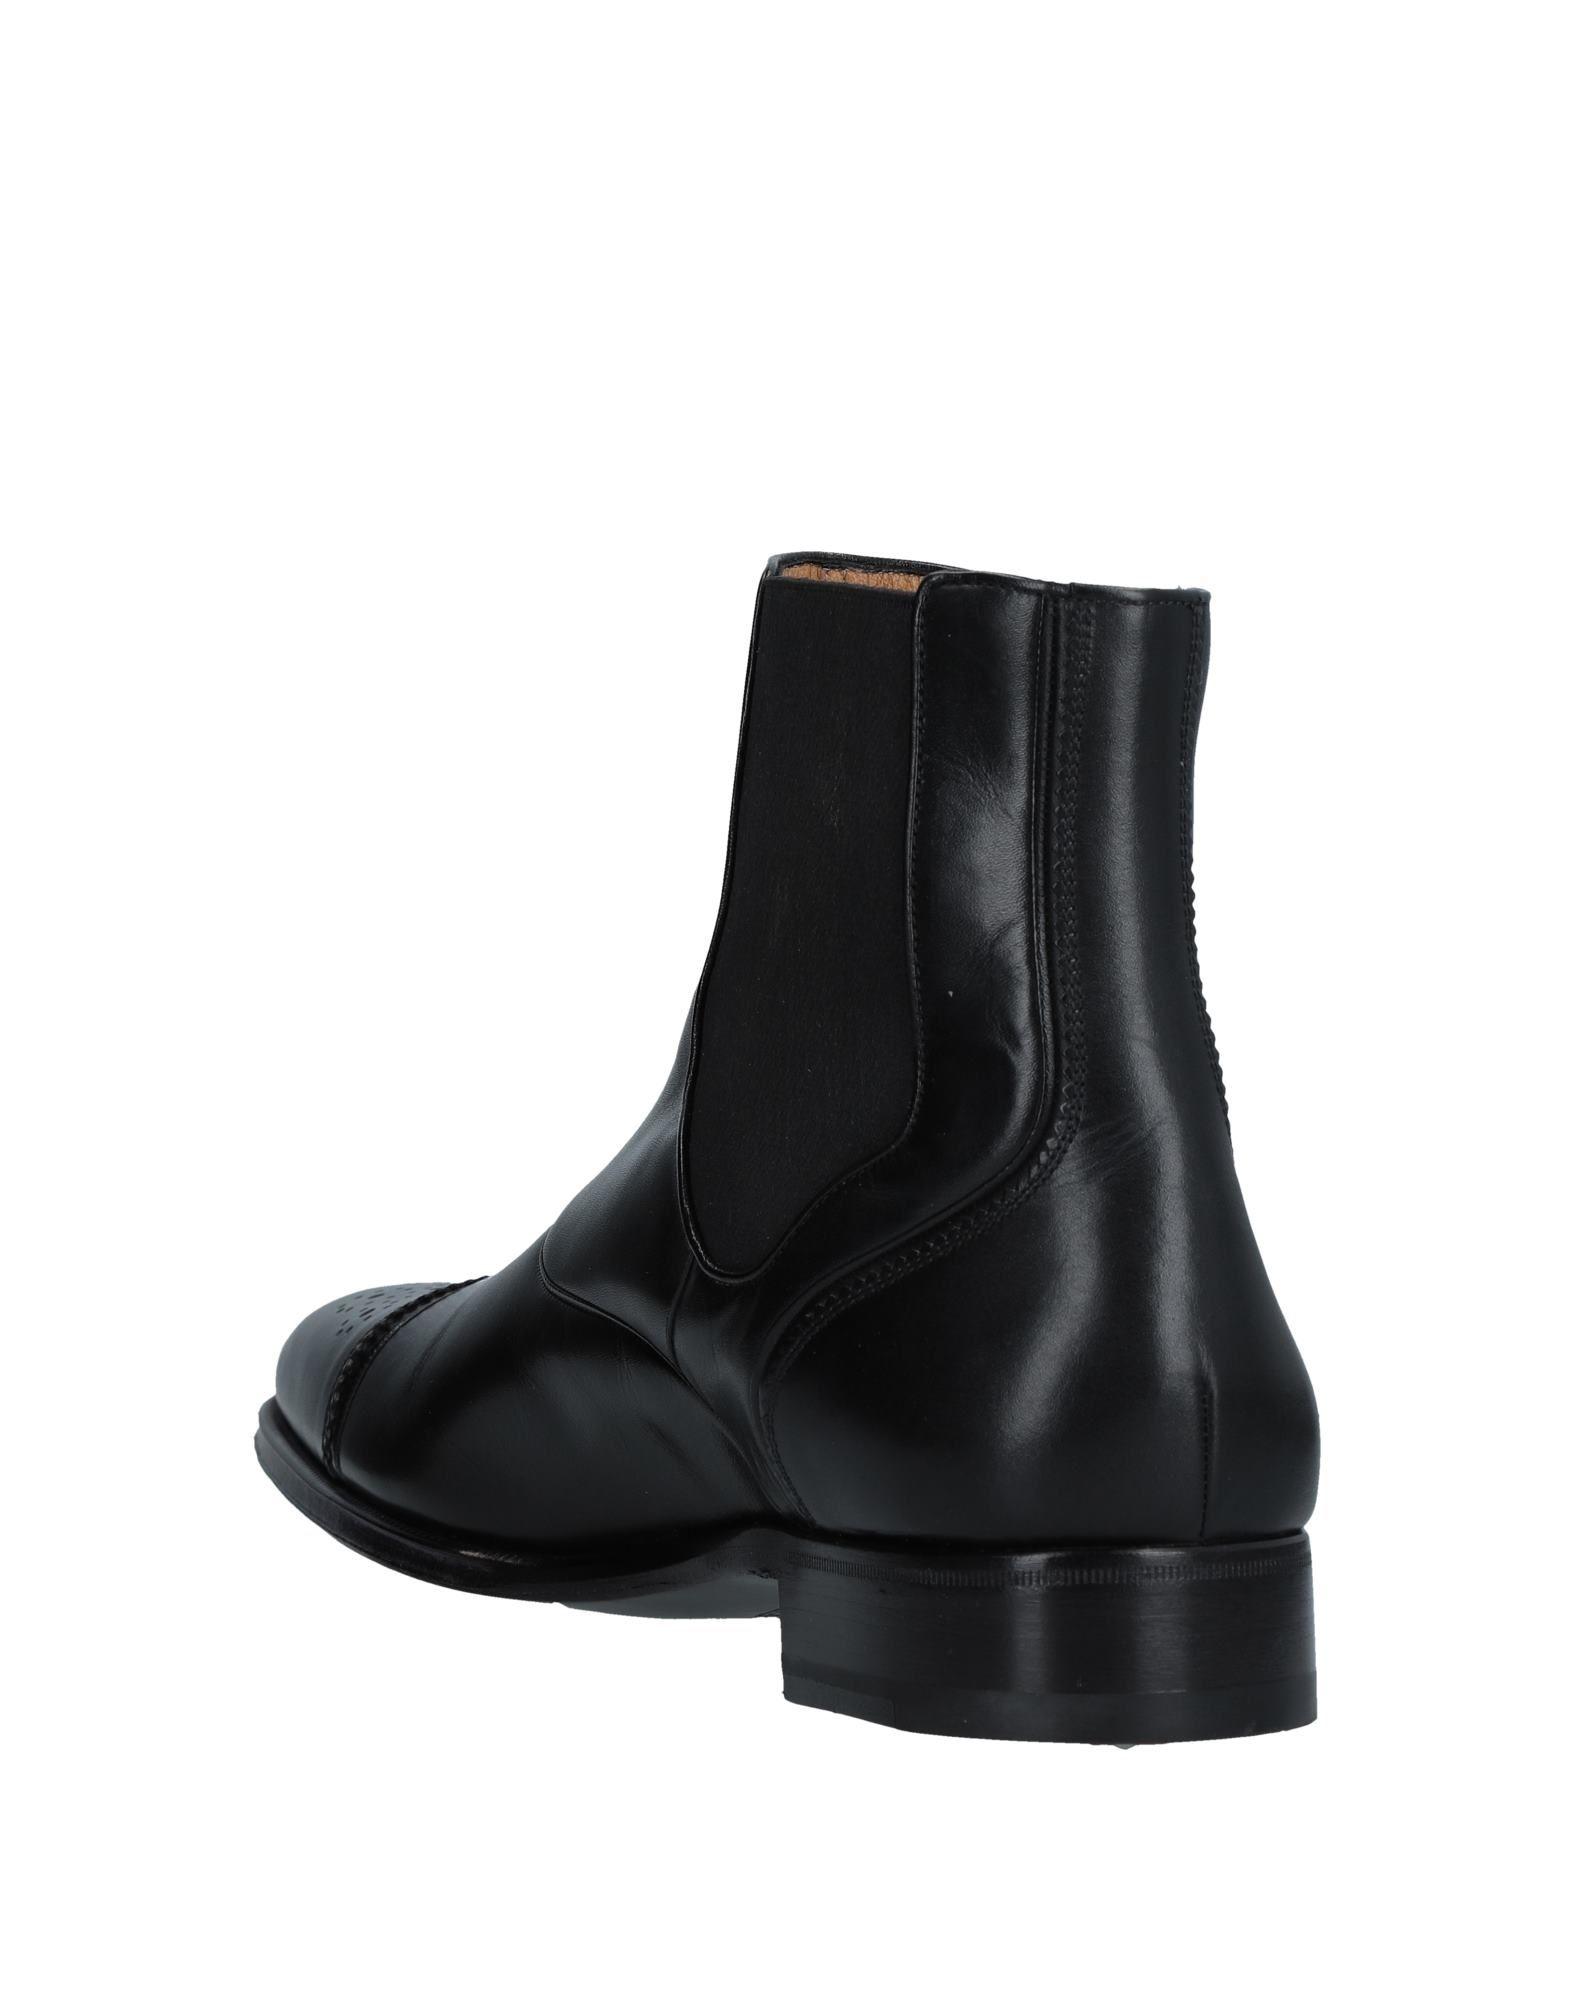 A.Testoni Boots - Men A.Testoni Boots online on    Australia - 11539446KP 1ecf15